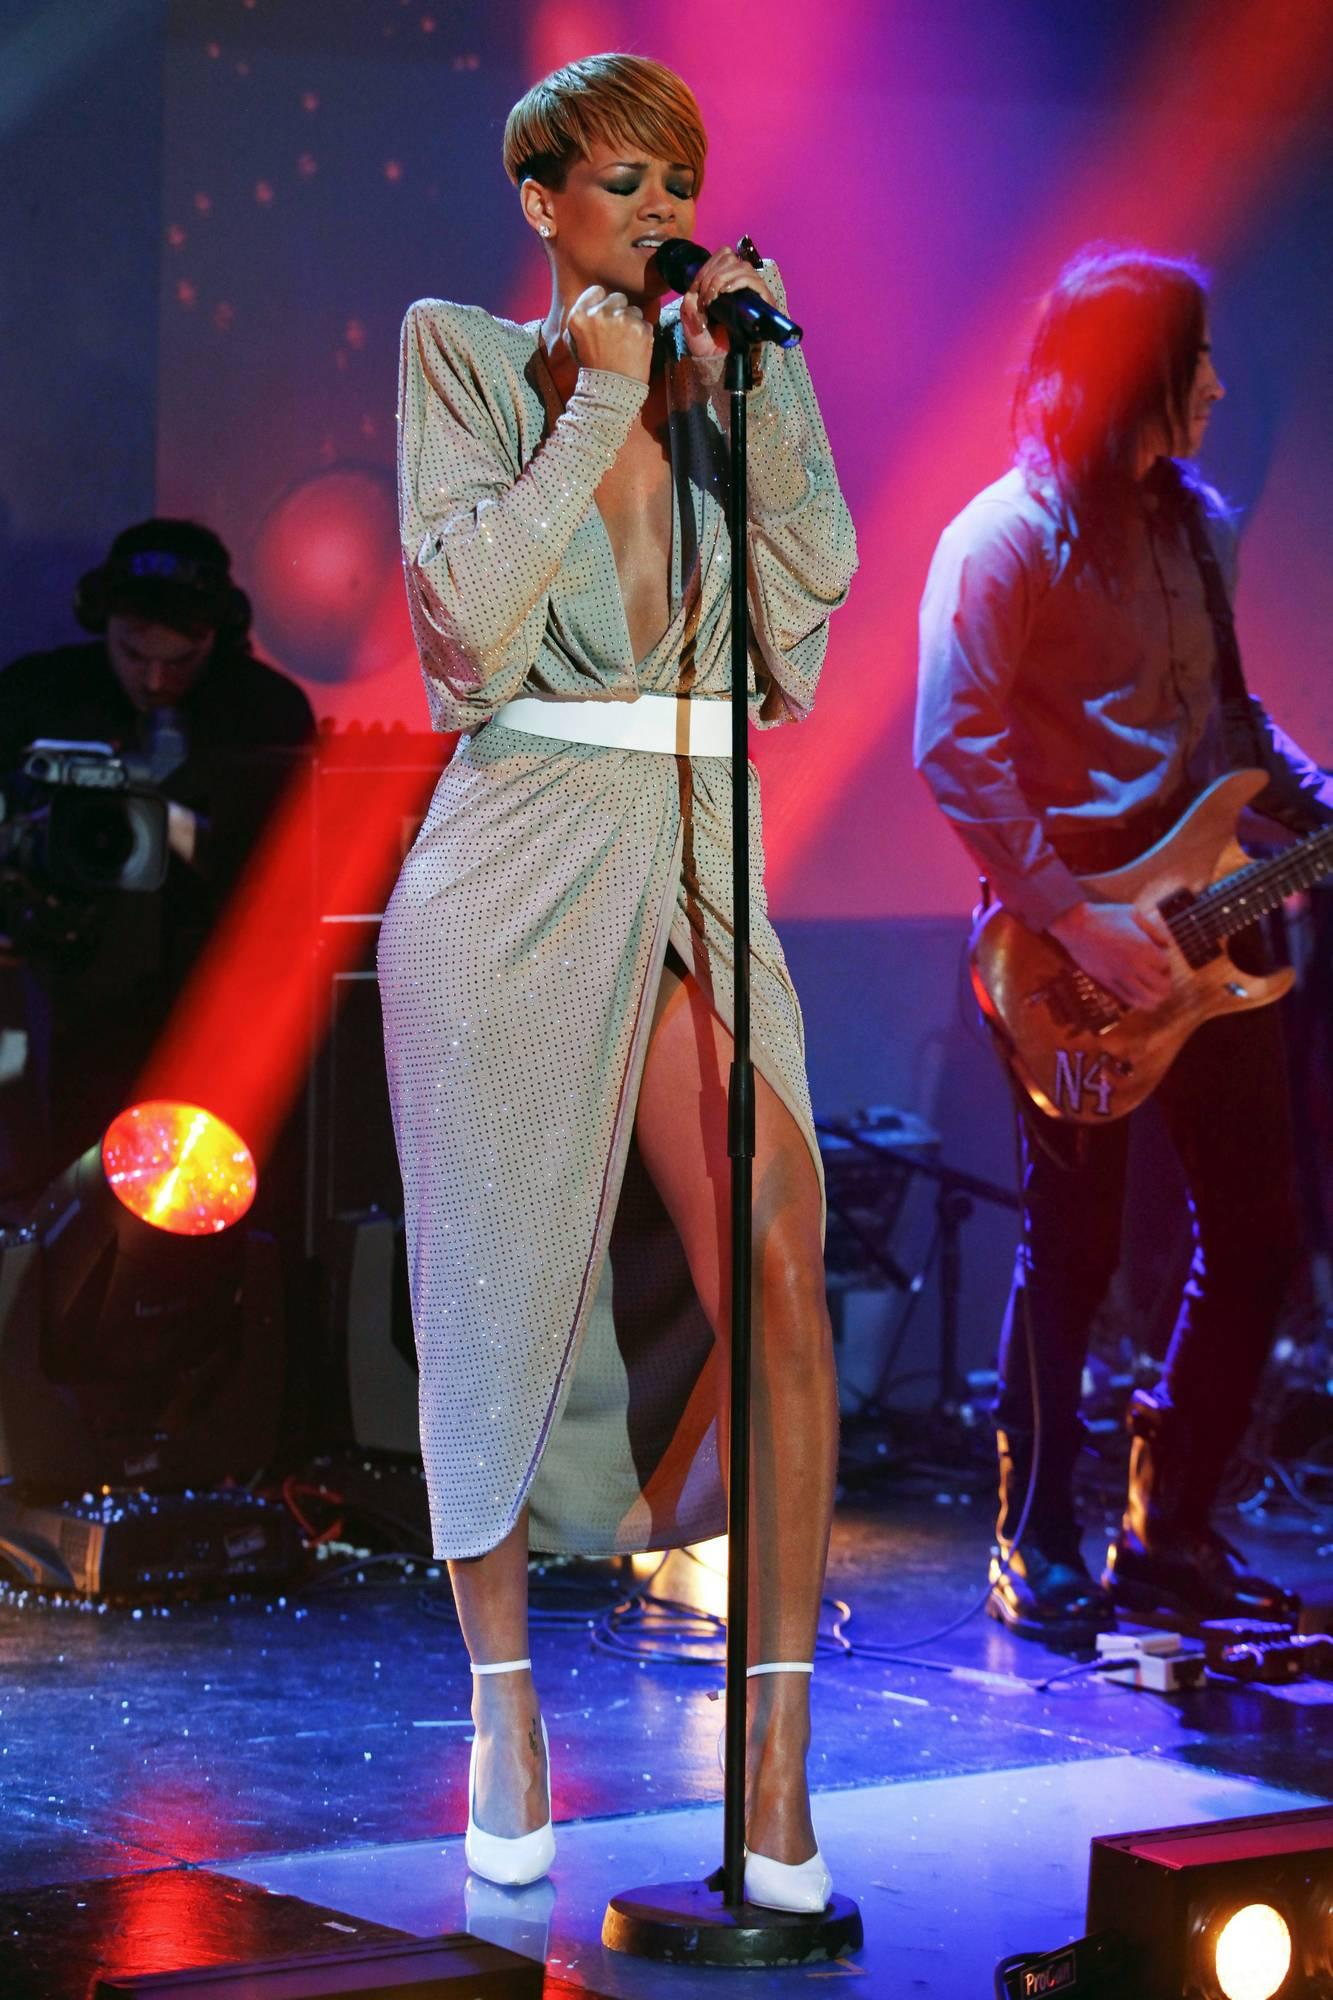 67791_Rihanna9_Cleavage9_Friday_Night_with_Jonathan_Ross3_18.12.2009_02_122_1161lo.jpg